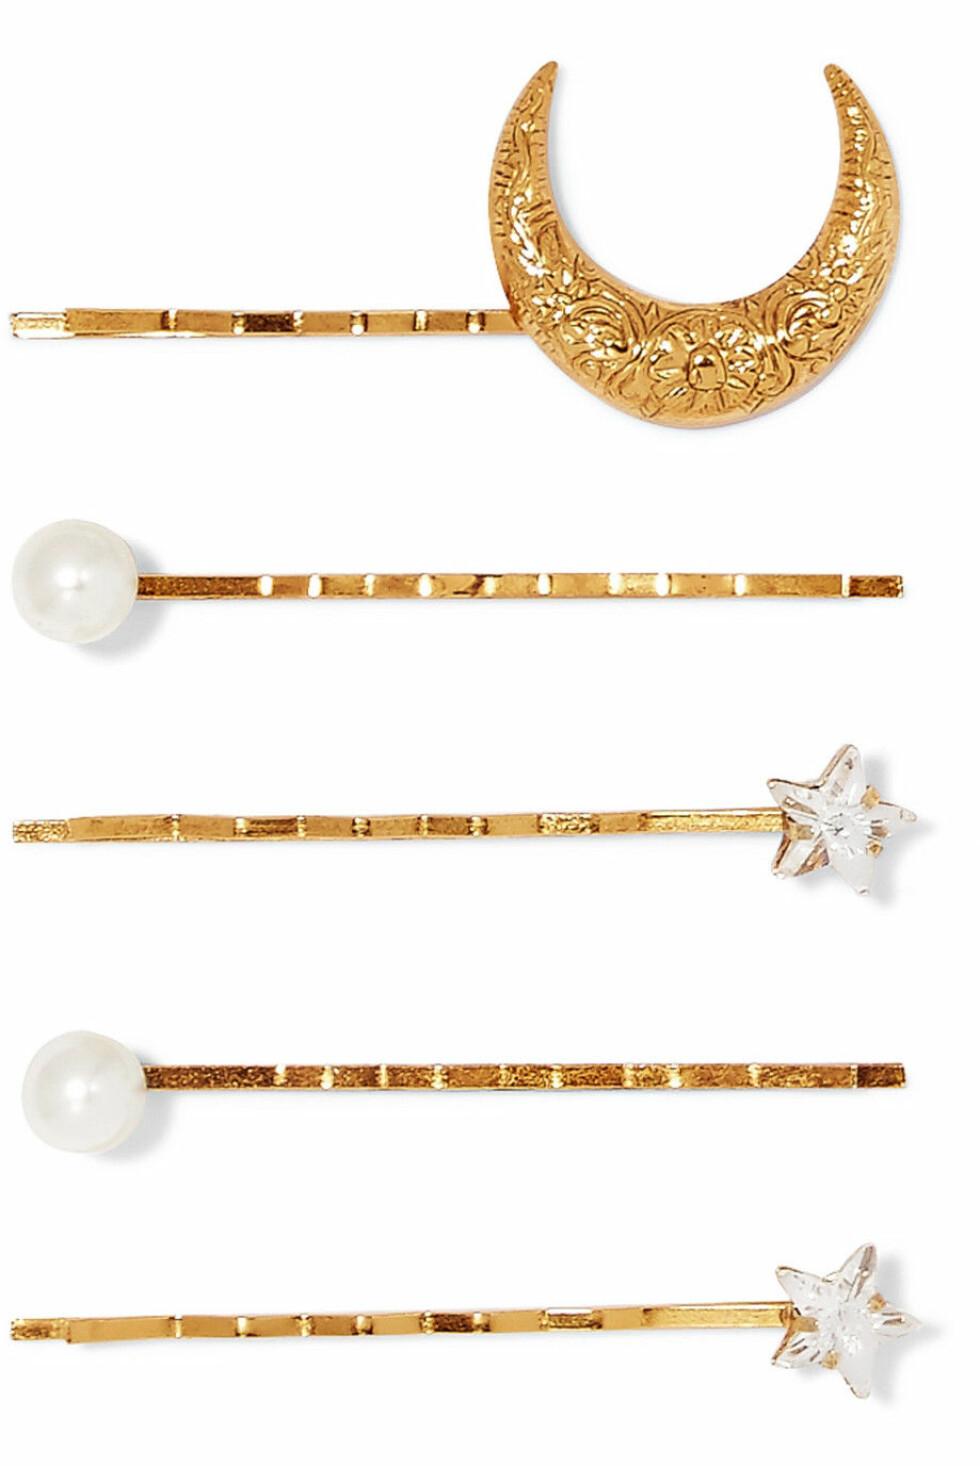 Jennifer Behr |1150,-| https://www.net-a-porter.com/no/en/product/1087007/jennifer_behr/set-of-five-gold-plated--swarovski-crystal-and-faux-pearl-hair-slides